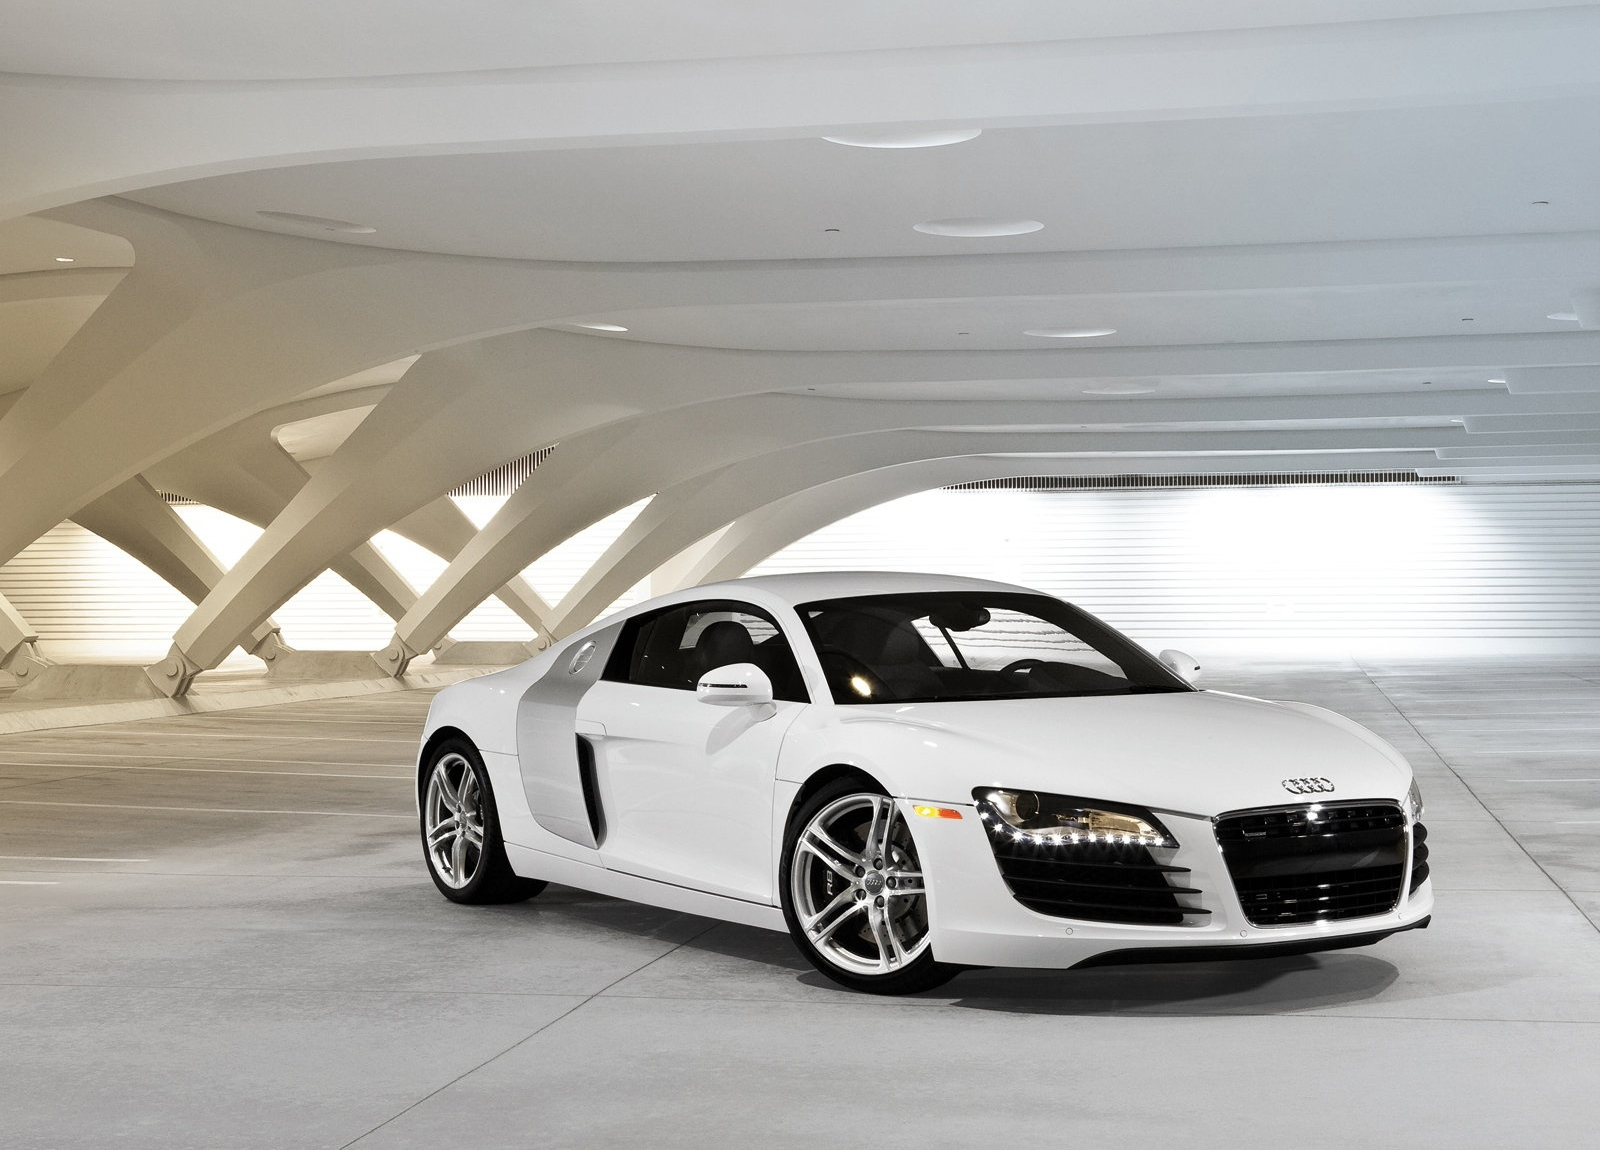 http://2.bp.blogspot.com/-NctdSIzNx70/Tz0ez3zAieI/AAAAAAAAEhk/L7aYBe9CxWI/s1600/Audi-2008_R8_wallpaper-1600x1200_0003.jpg